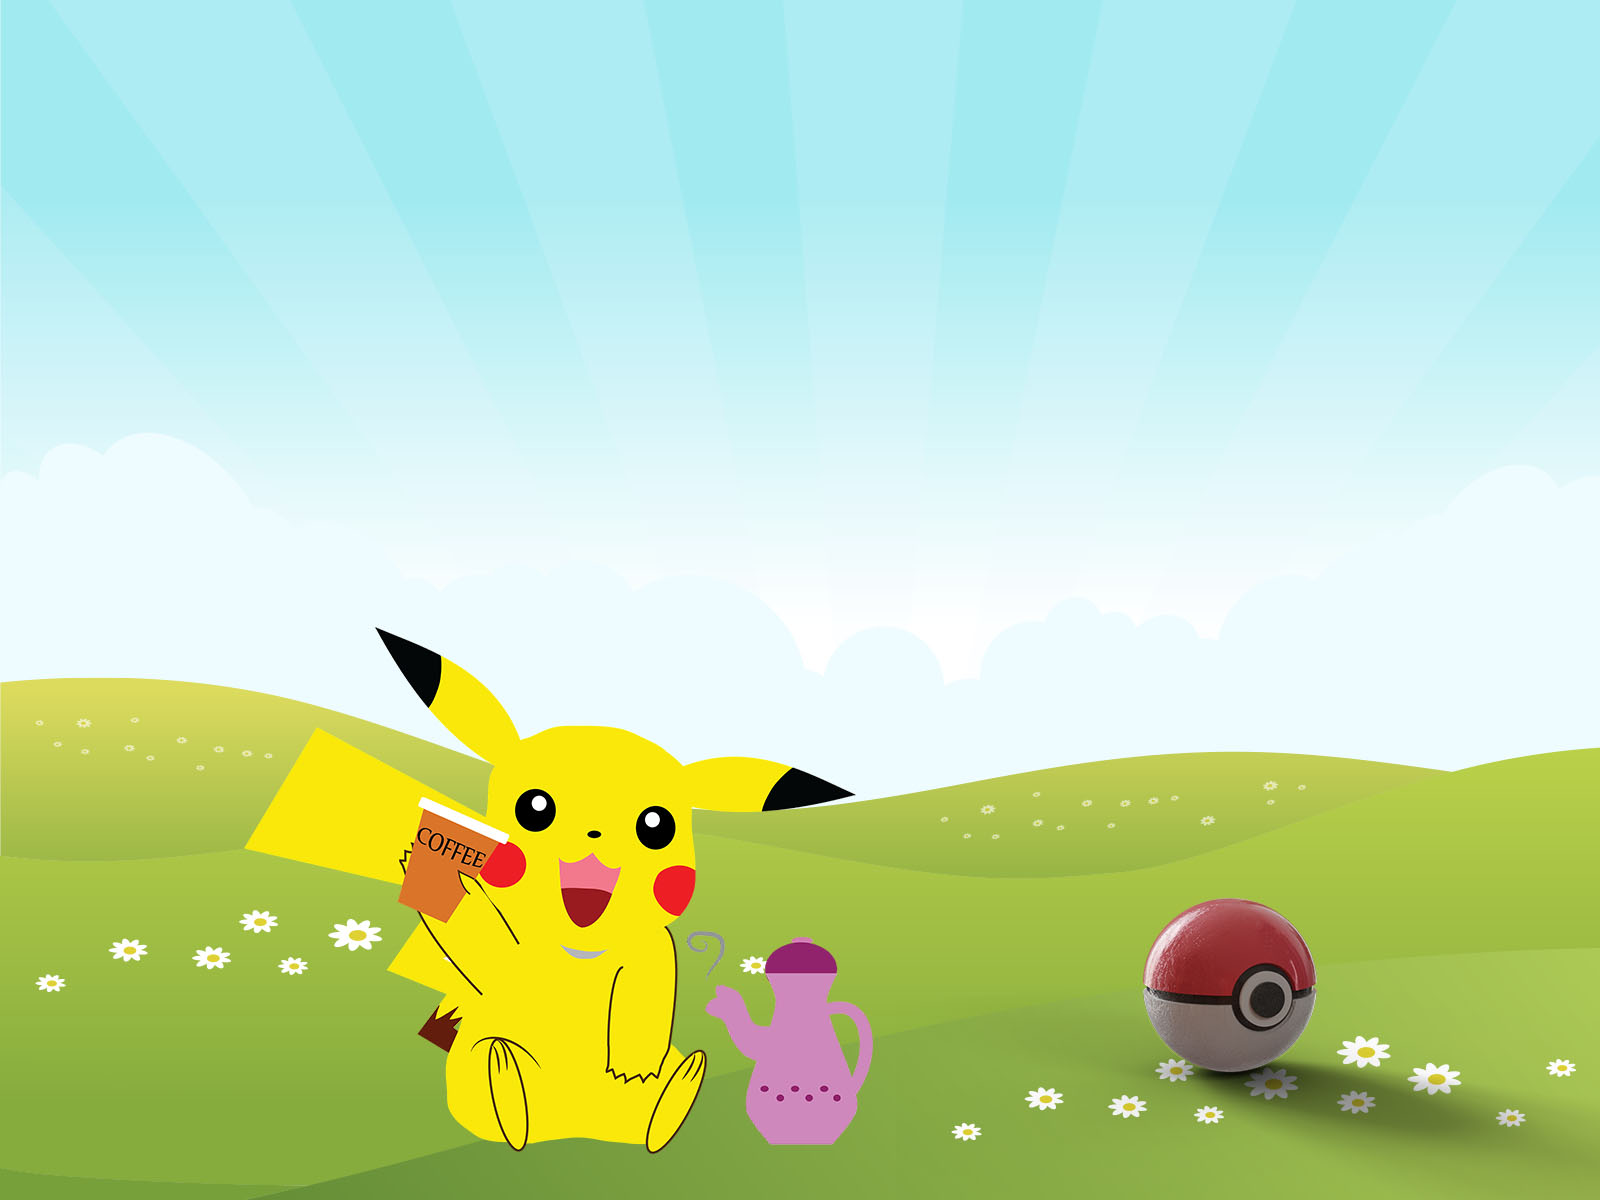 Pokemon Pikachu Backgrounds Cartoon Yellow Templates Free Ppt